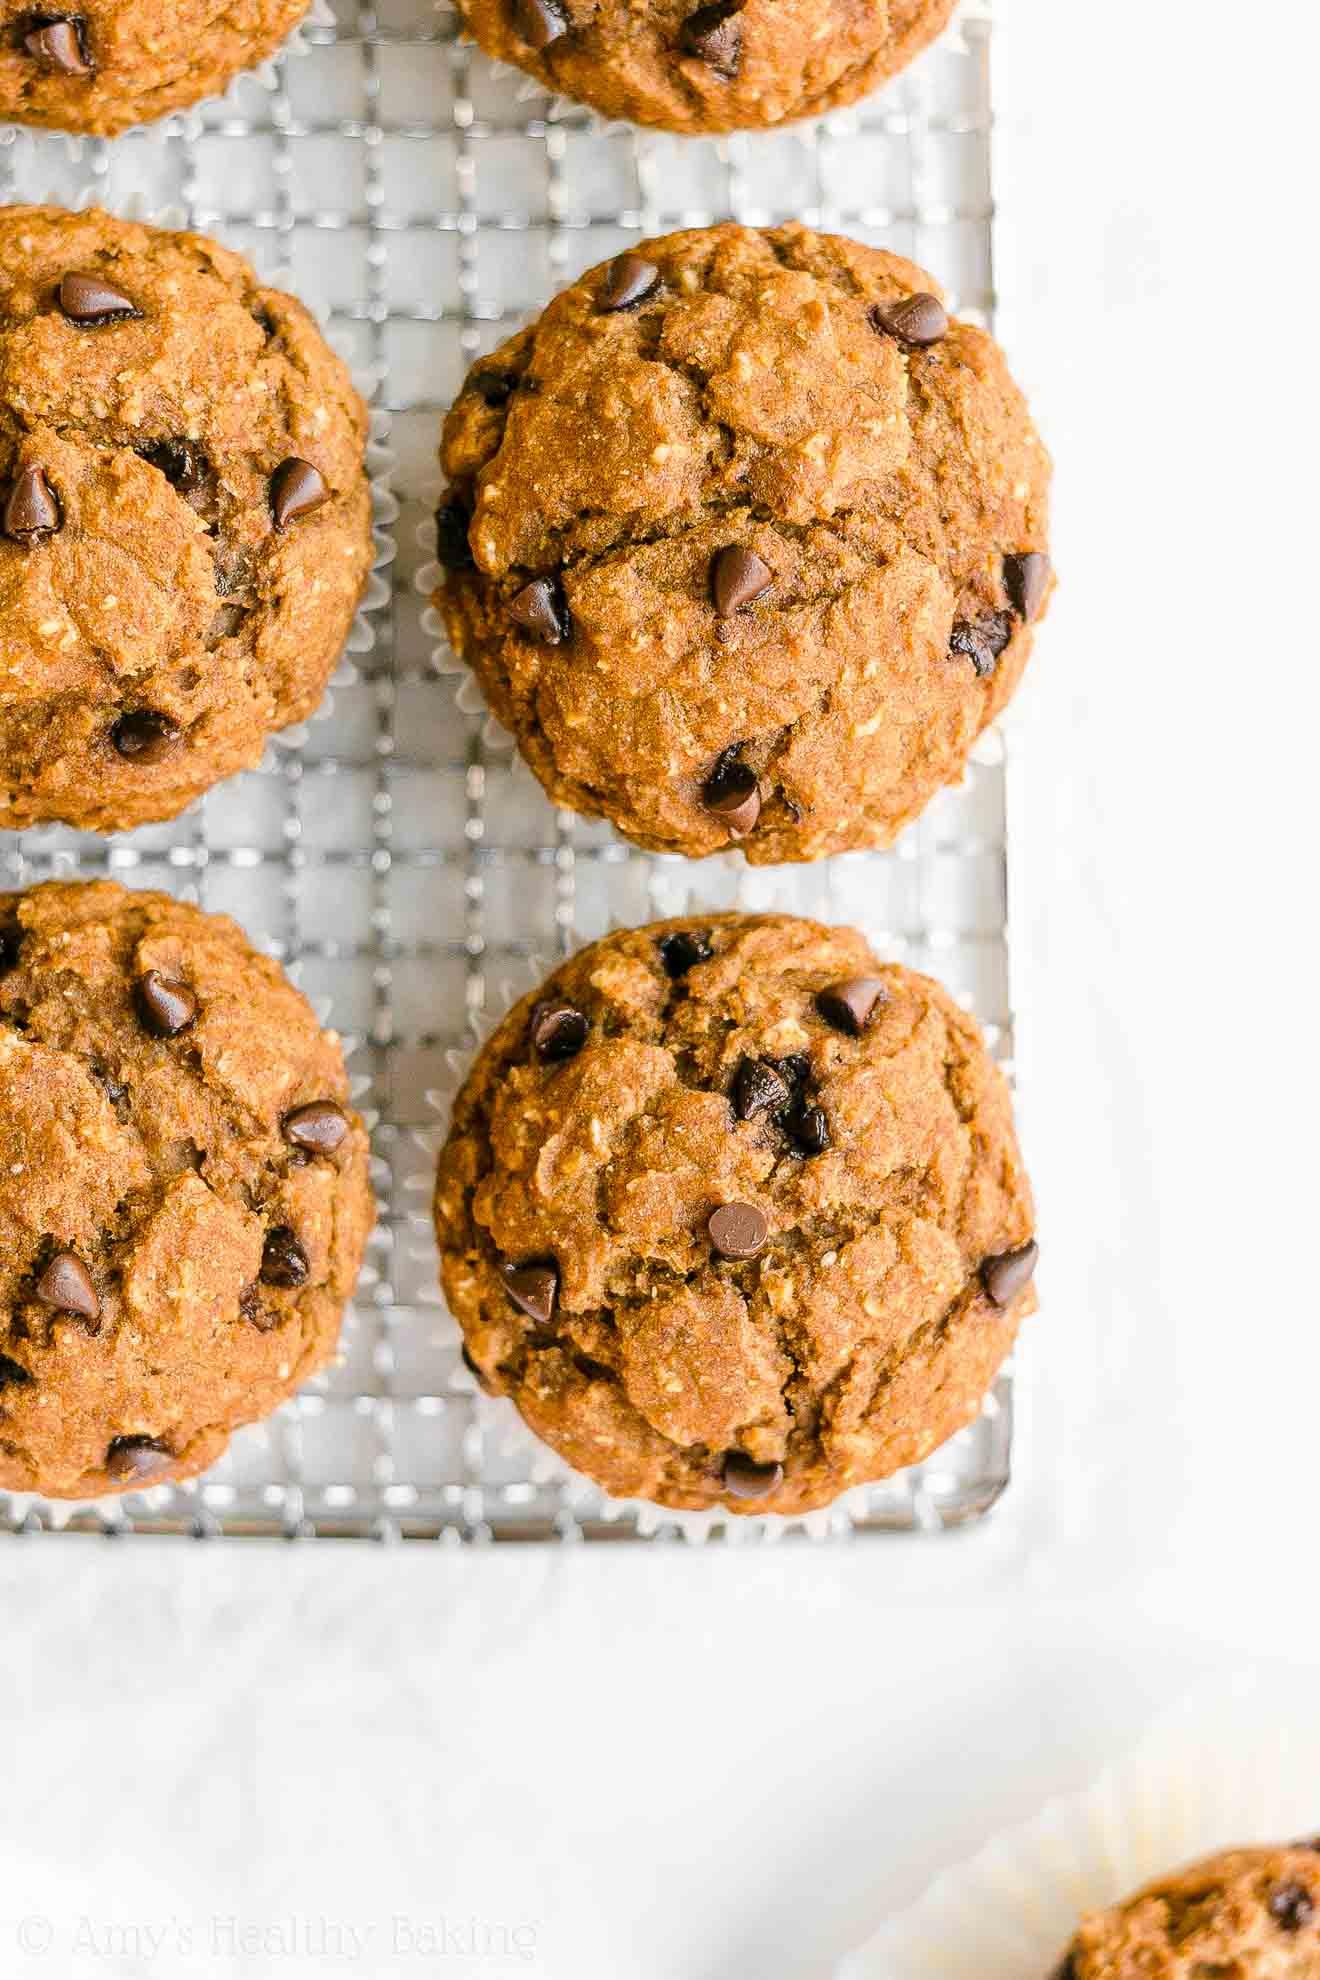 Easy Healthy Gluten Free Low Sugar Pumpkin Chocolate Chip Oatmeal Muffins